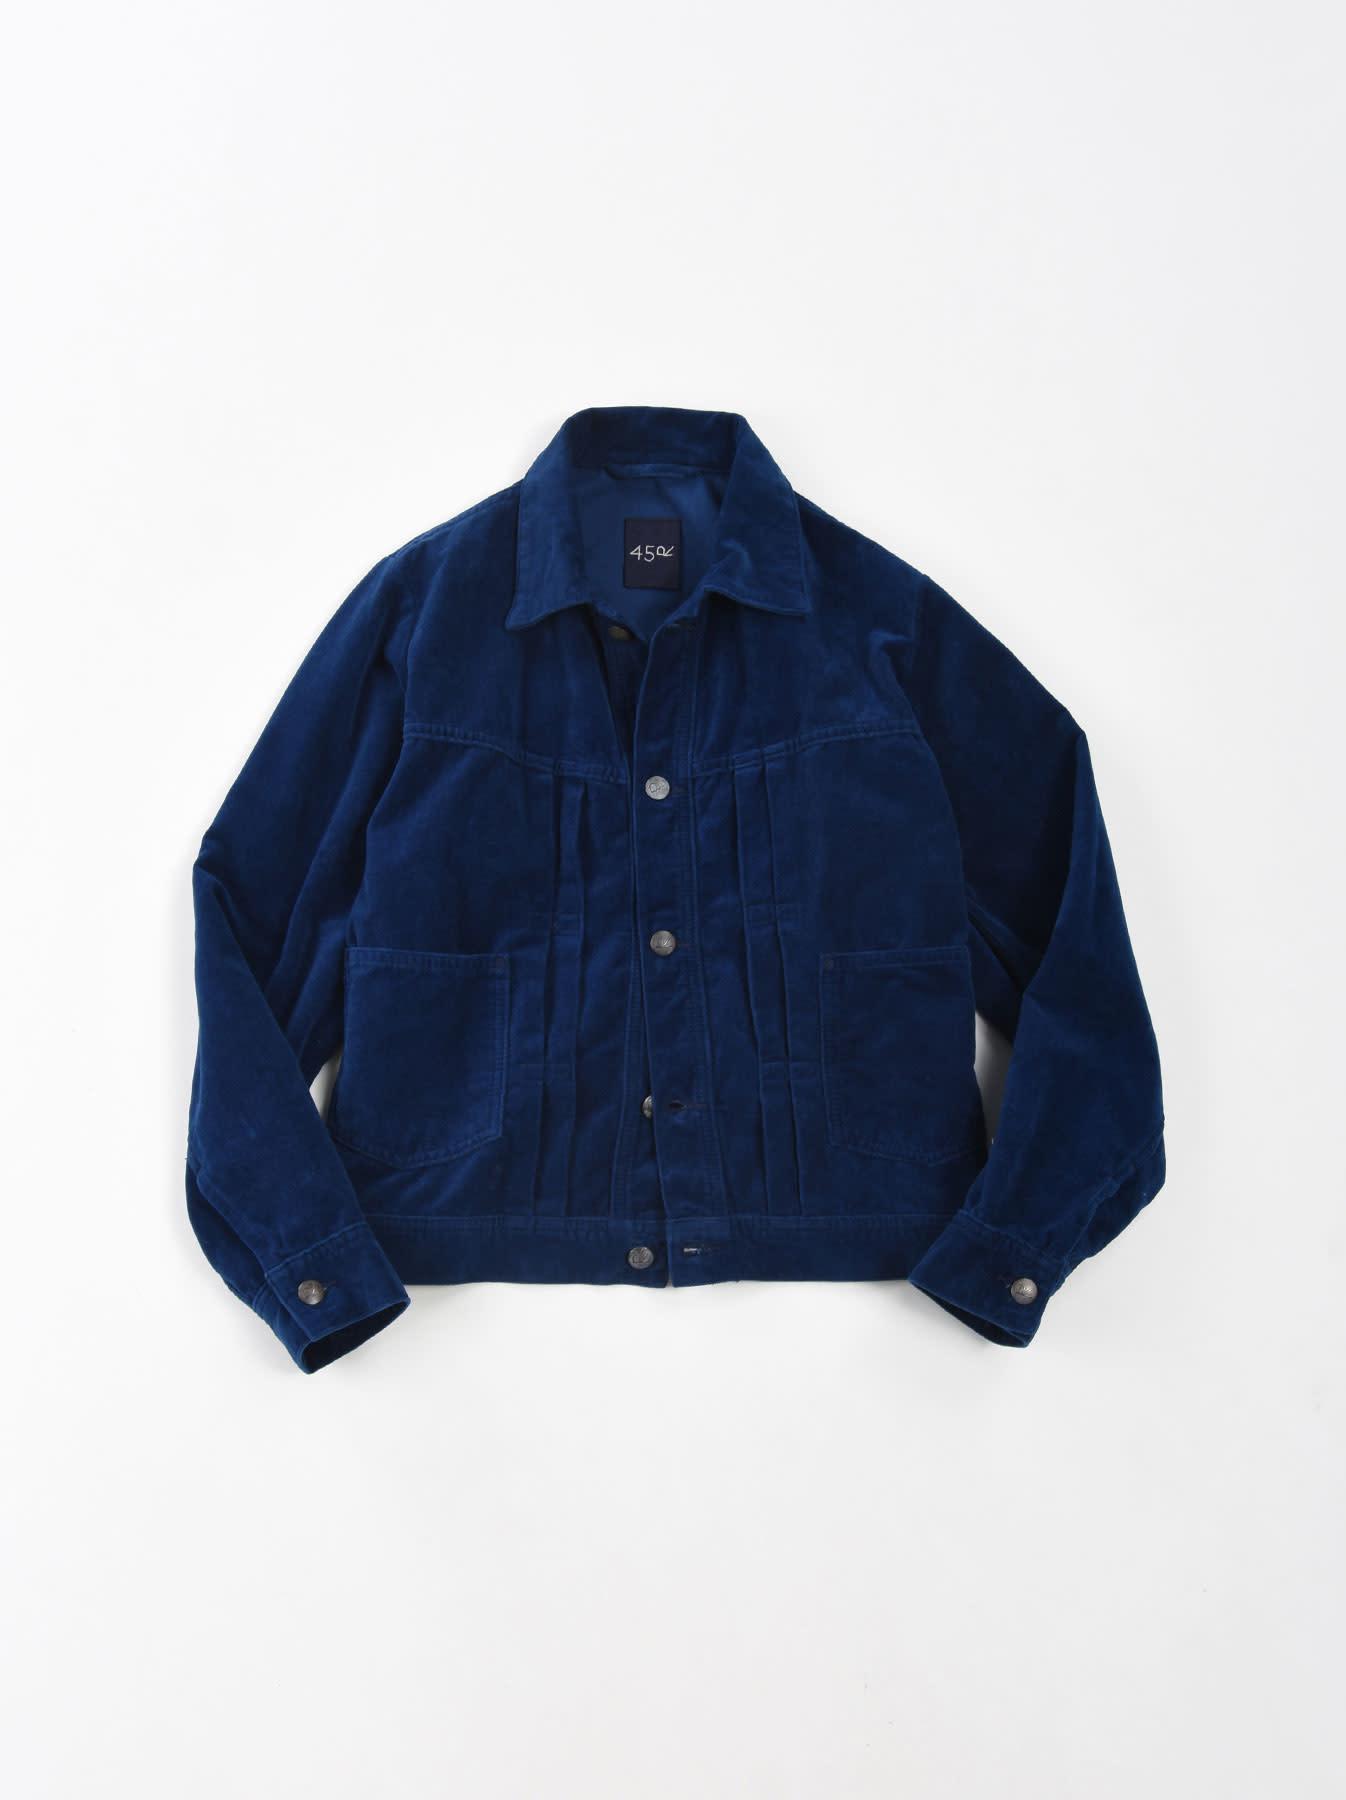 Indigo Velveteen 908 Denim Jacket-1